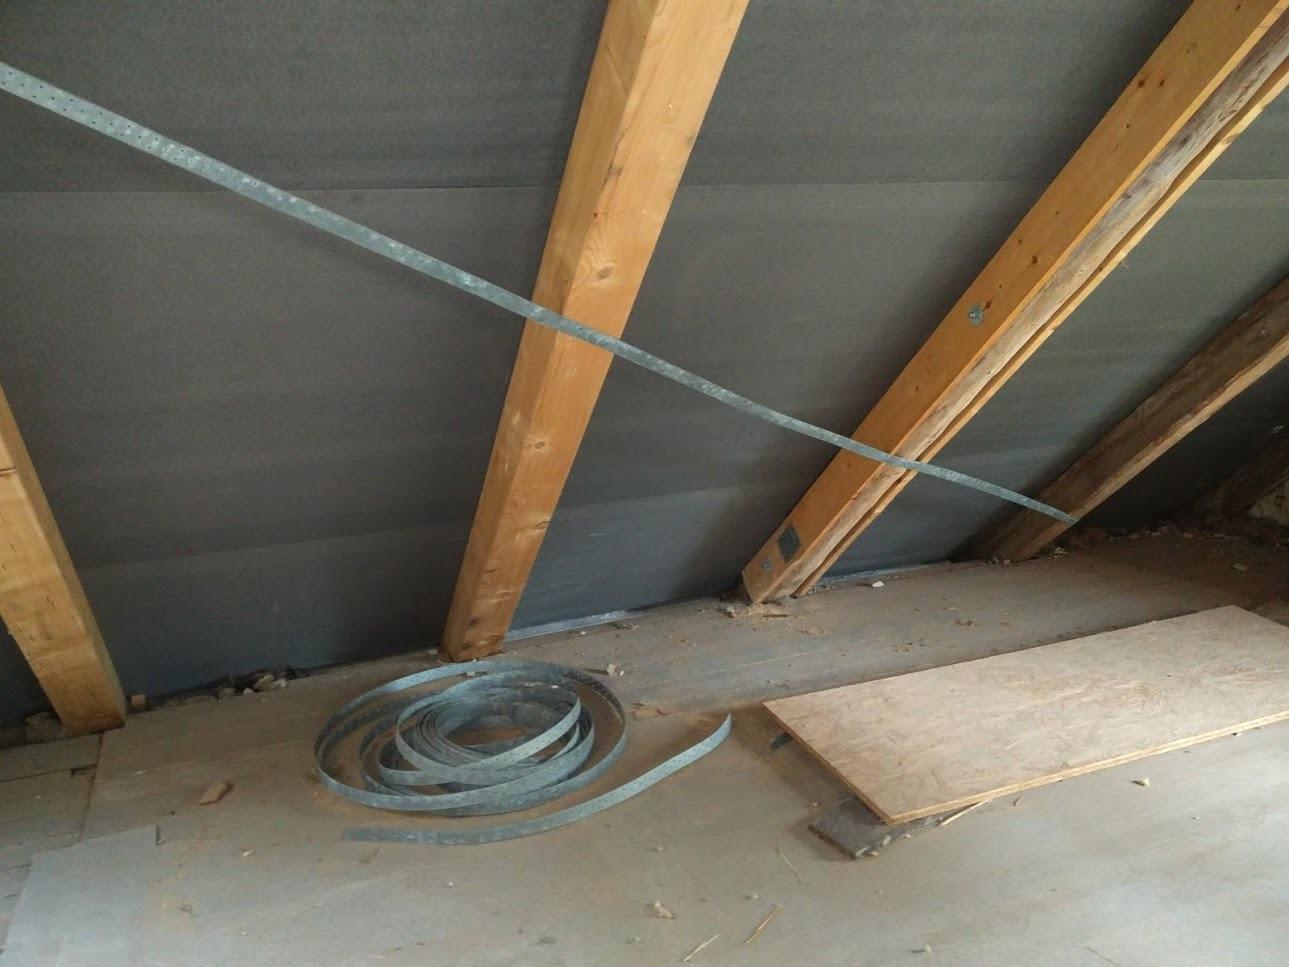 Dachbodenausbau | Wer-weiss-was.de